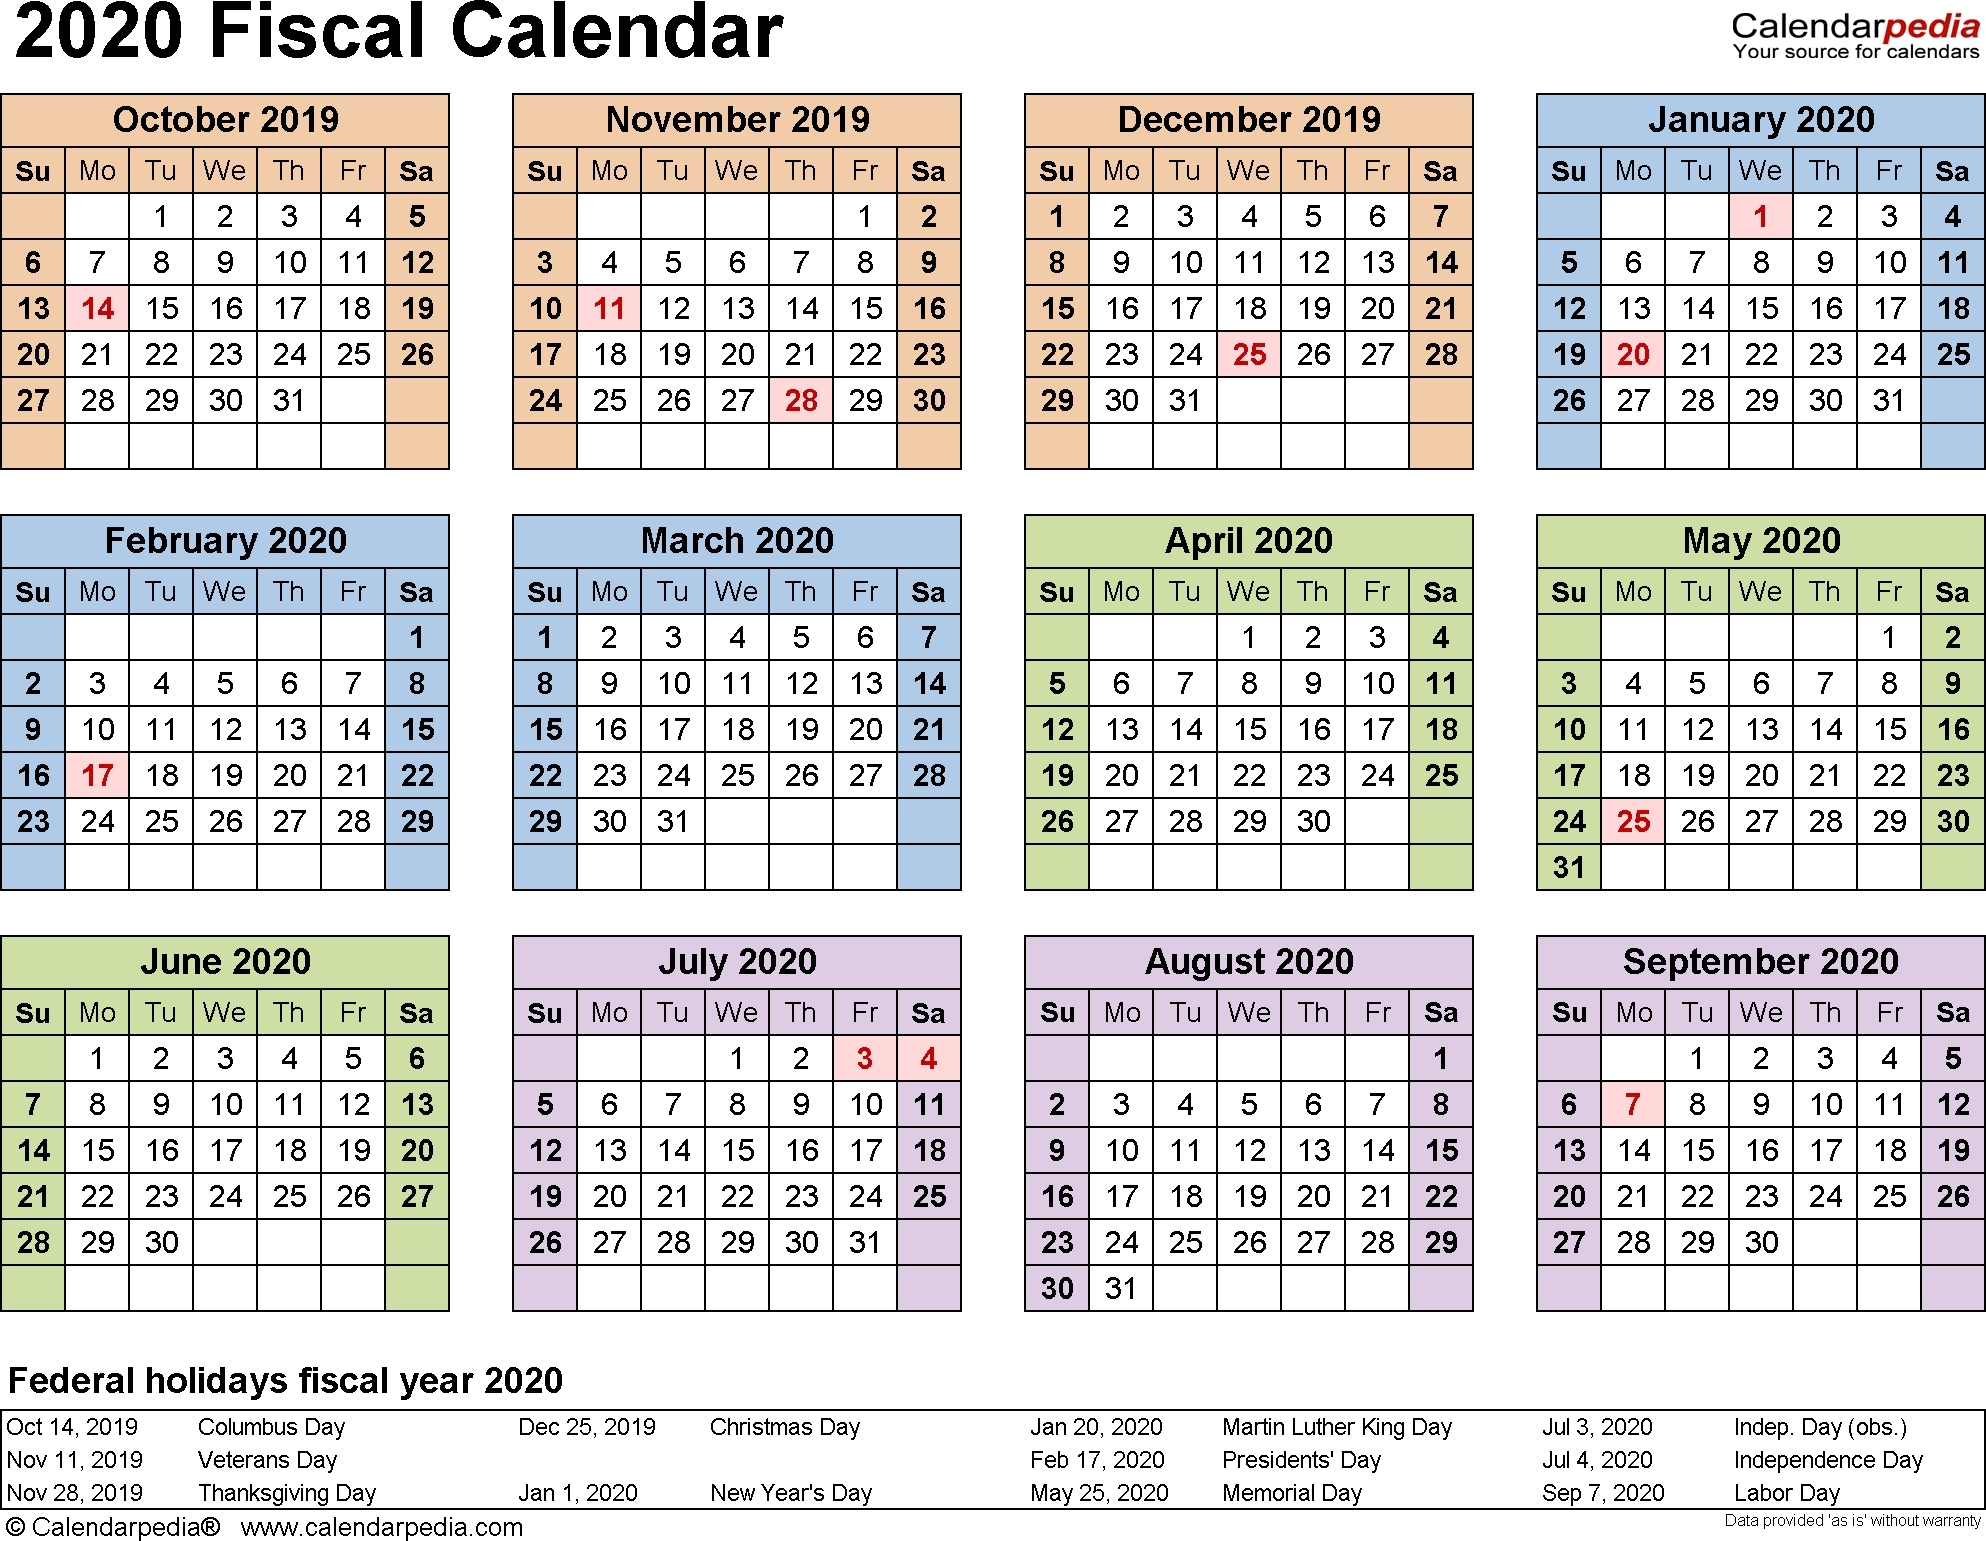 Payroll Calendar 2020 Opm | Payroll Calendar 2020  2020 Government Payroll Calendar